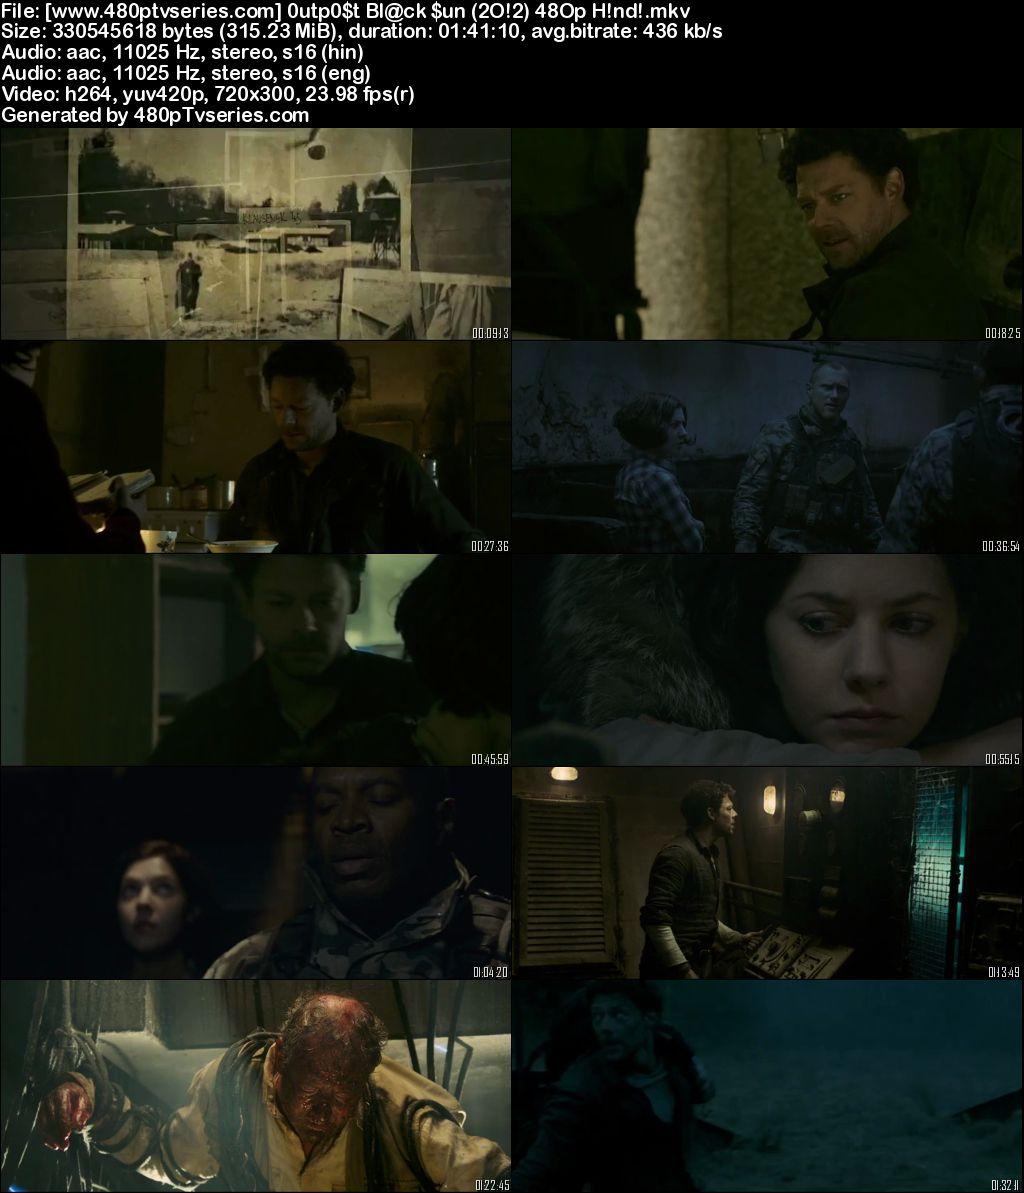 Outpost Black Sun (2012) 300MB Full Hindi Dual Audio Movie Download 480p Bluray Free Watch Online Full Movie Download Worldfree4u 9xmovies